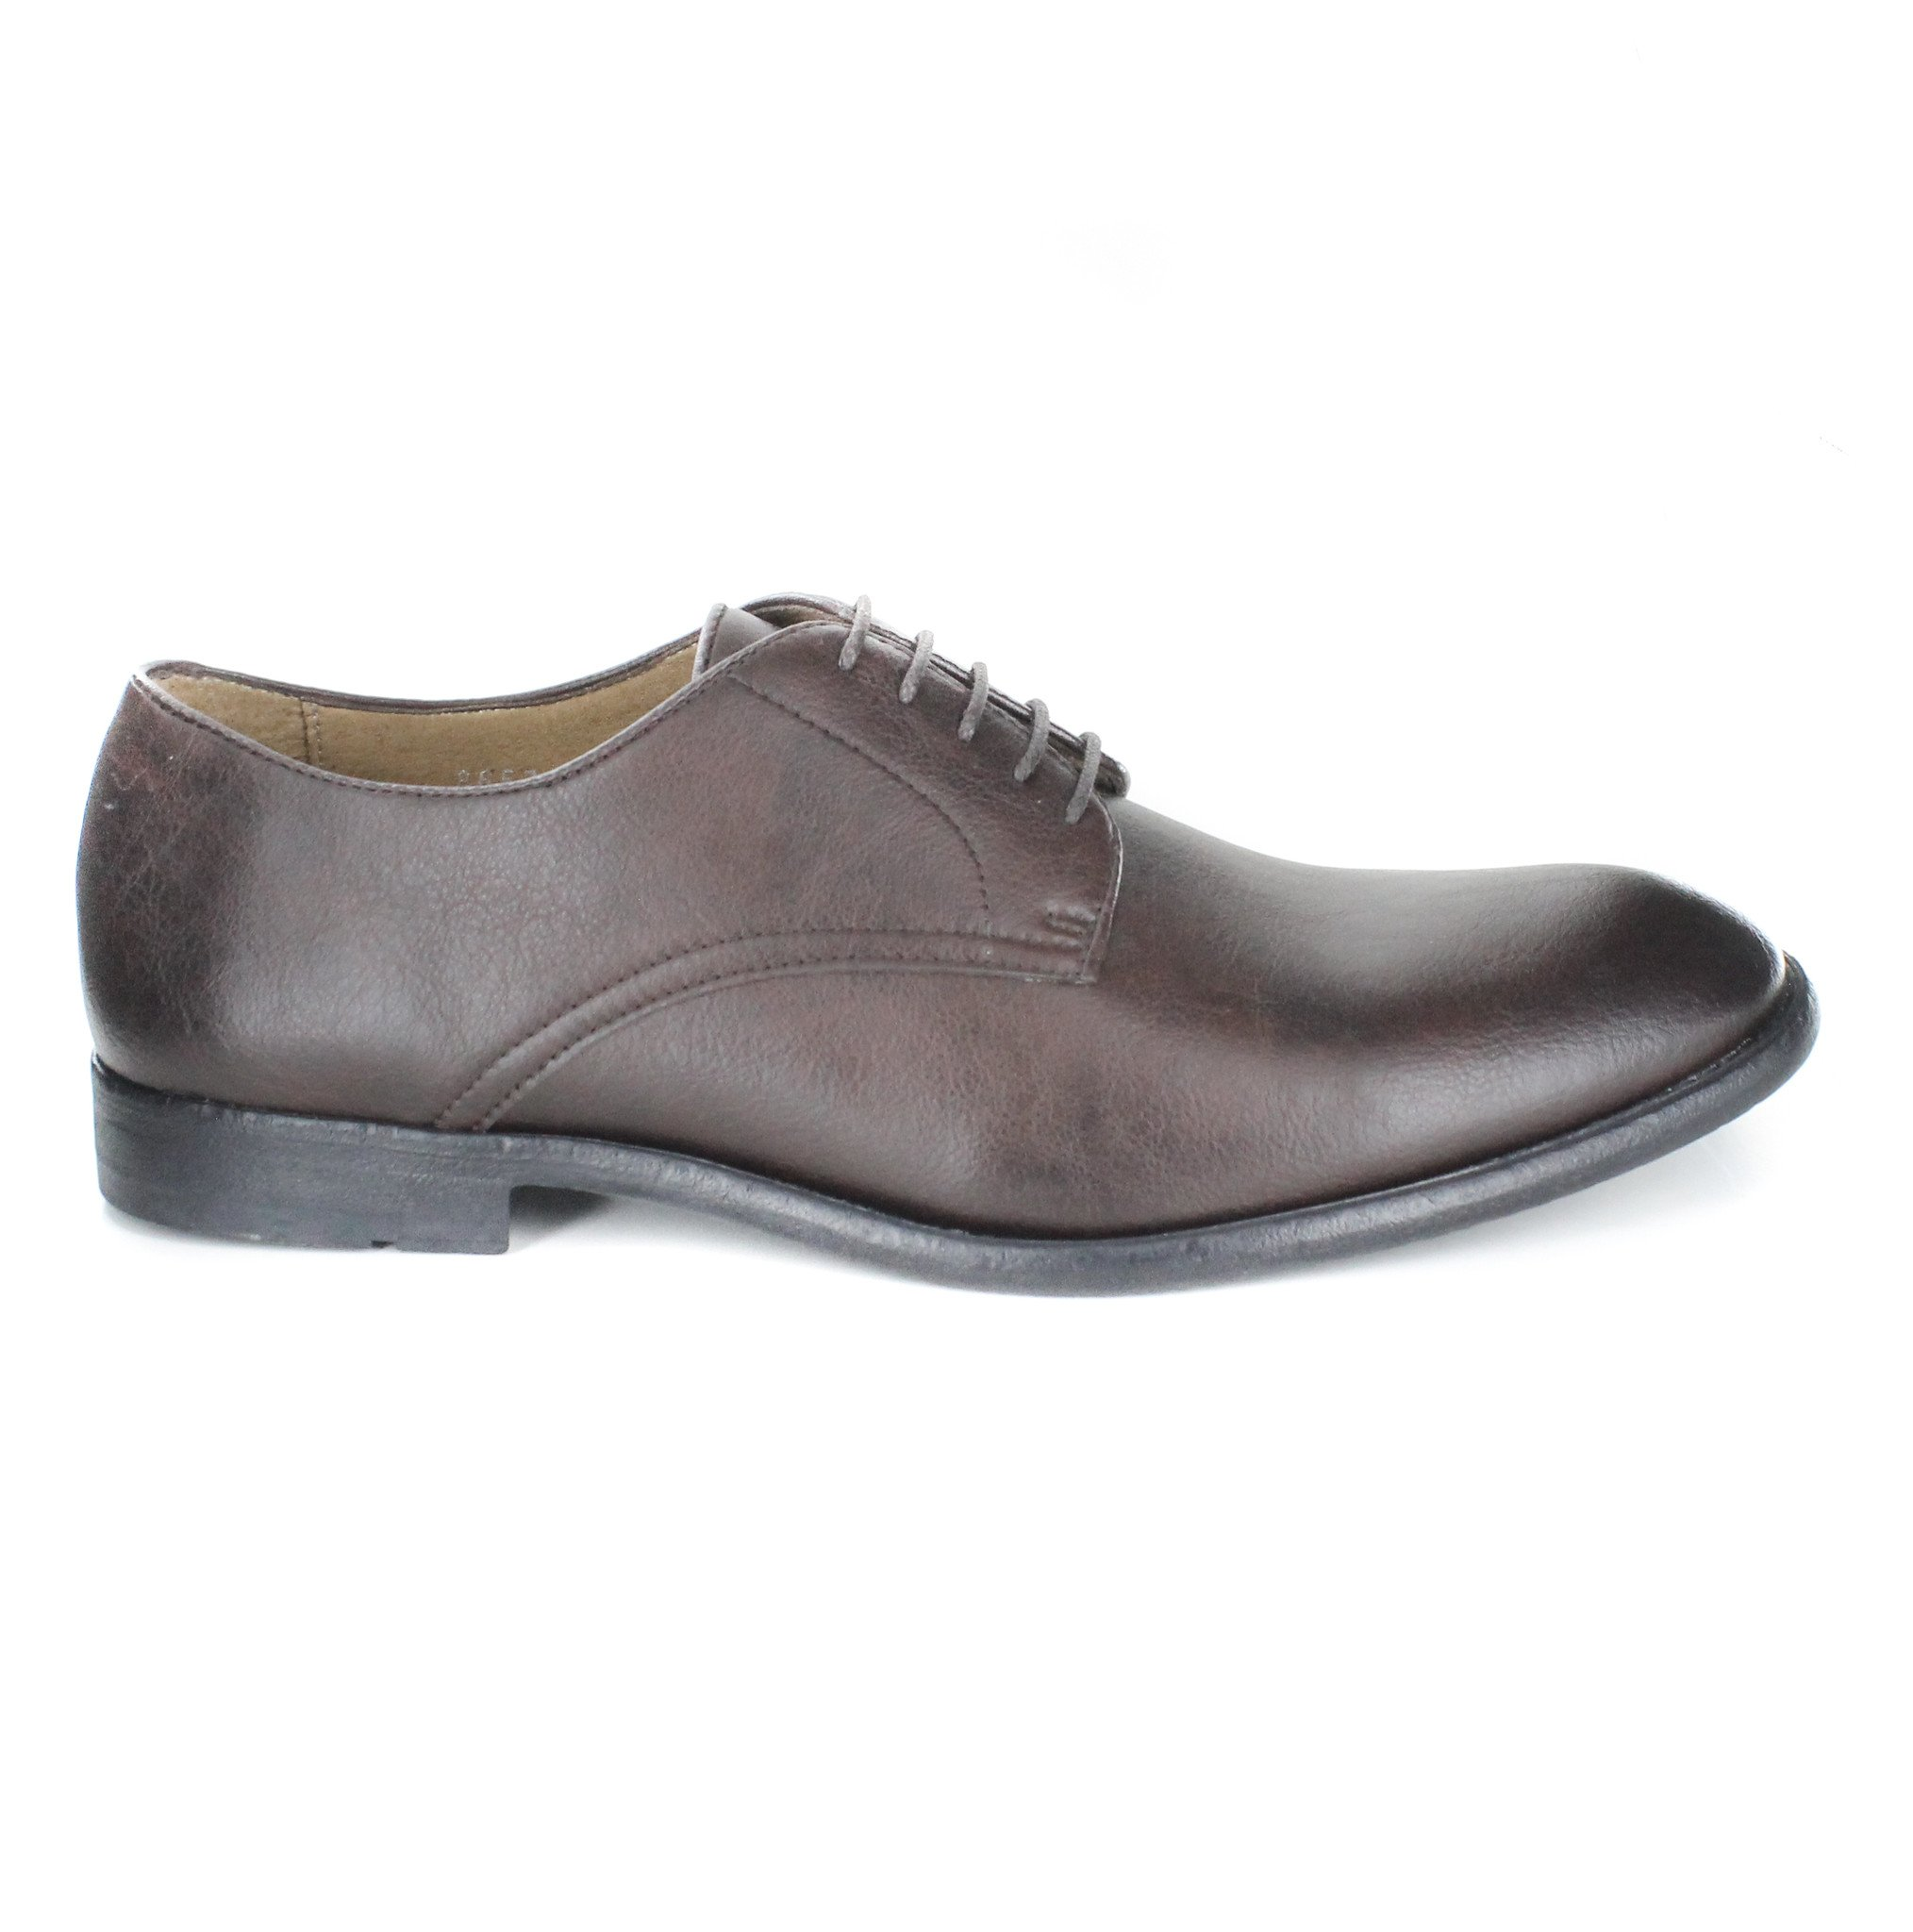 vegan dress shoes Thaddeus in Brown from Novacas